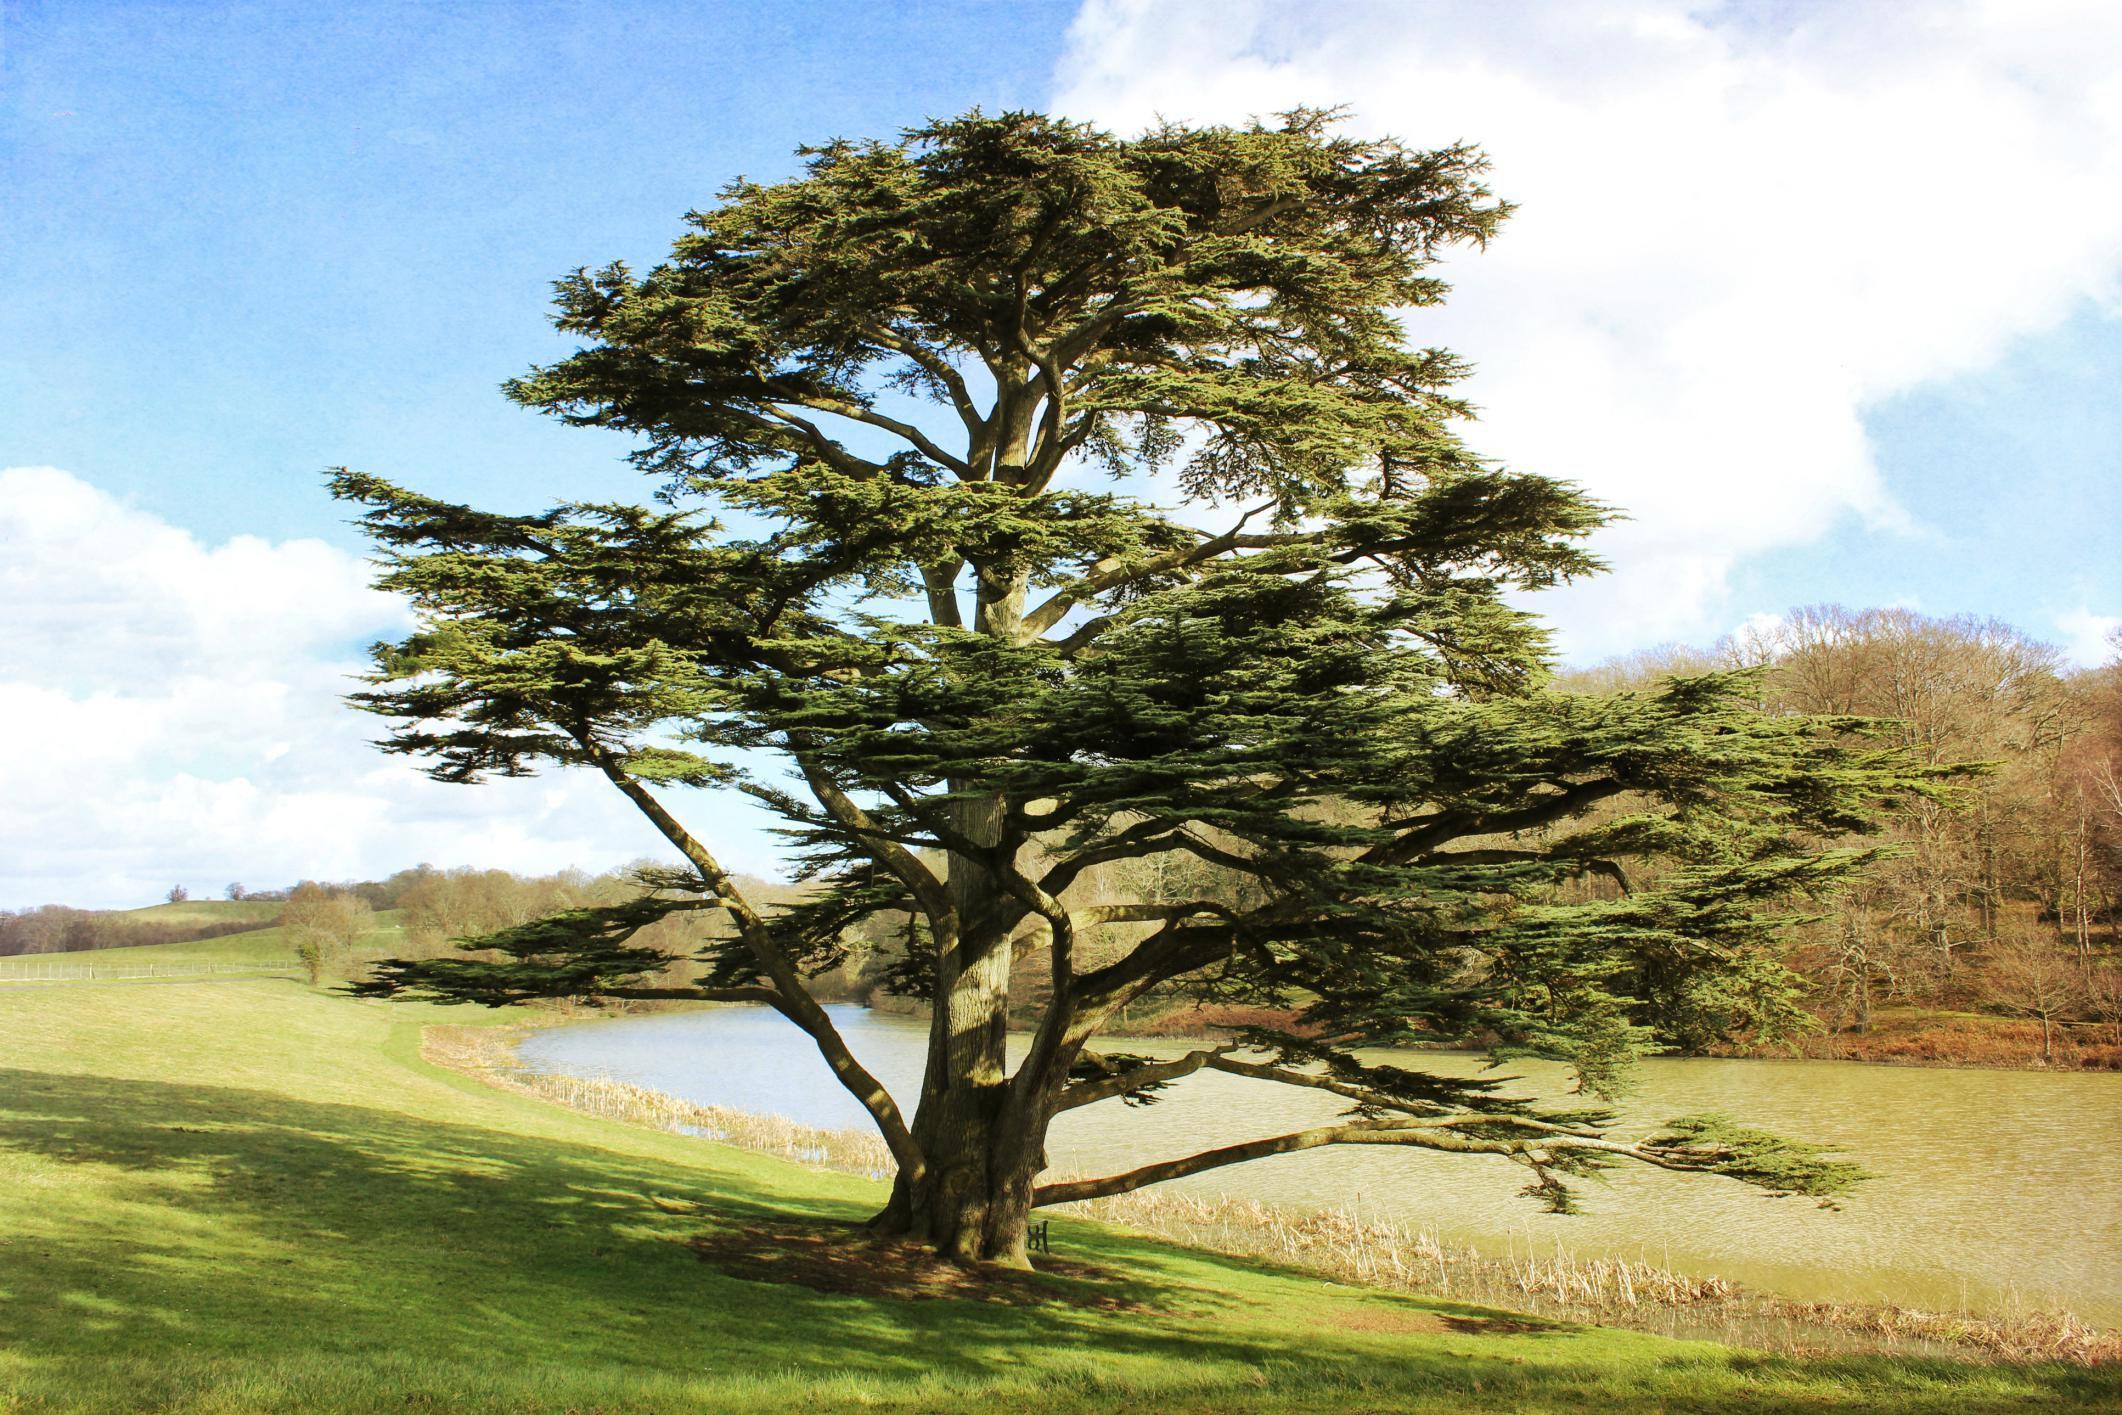 Cedars Of Lebanon ~ Growing the cedar of lebanon tree